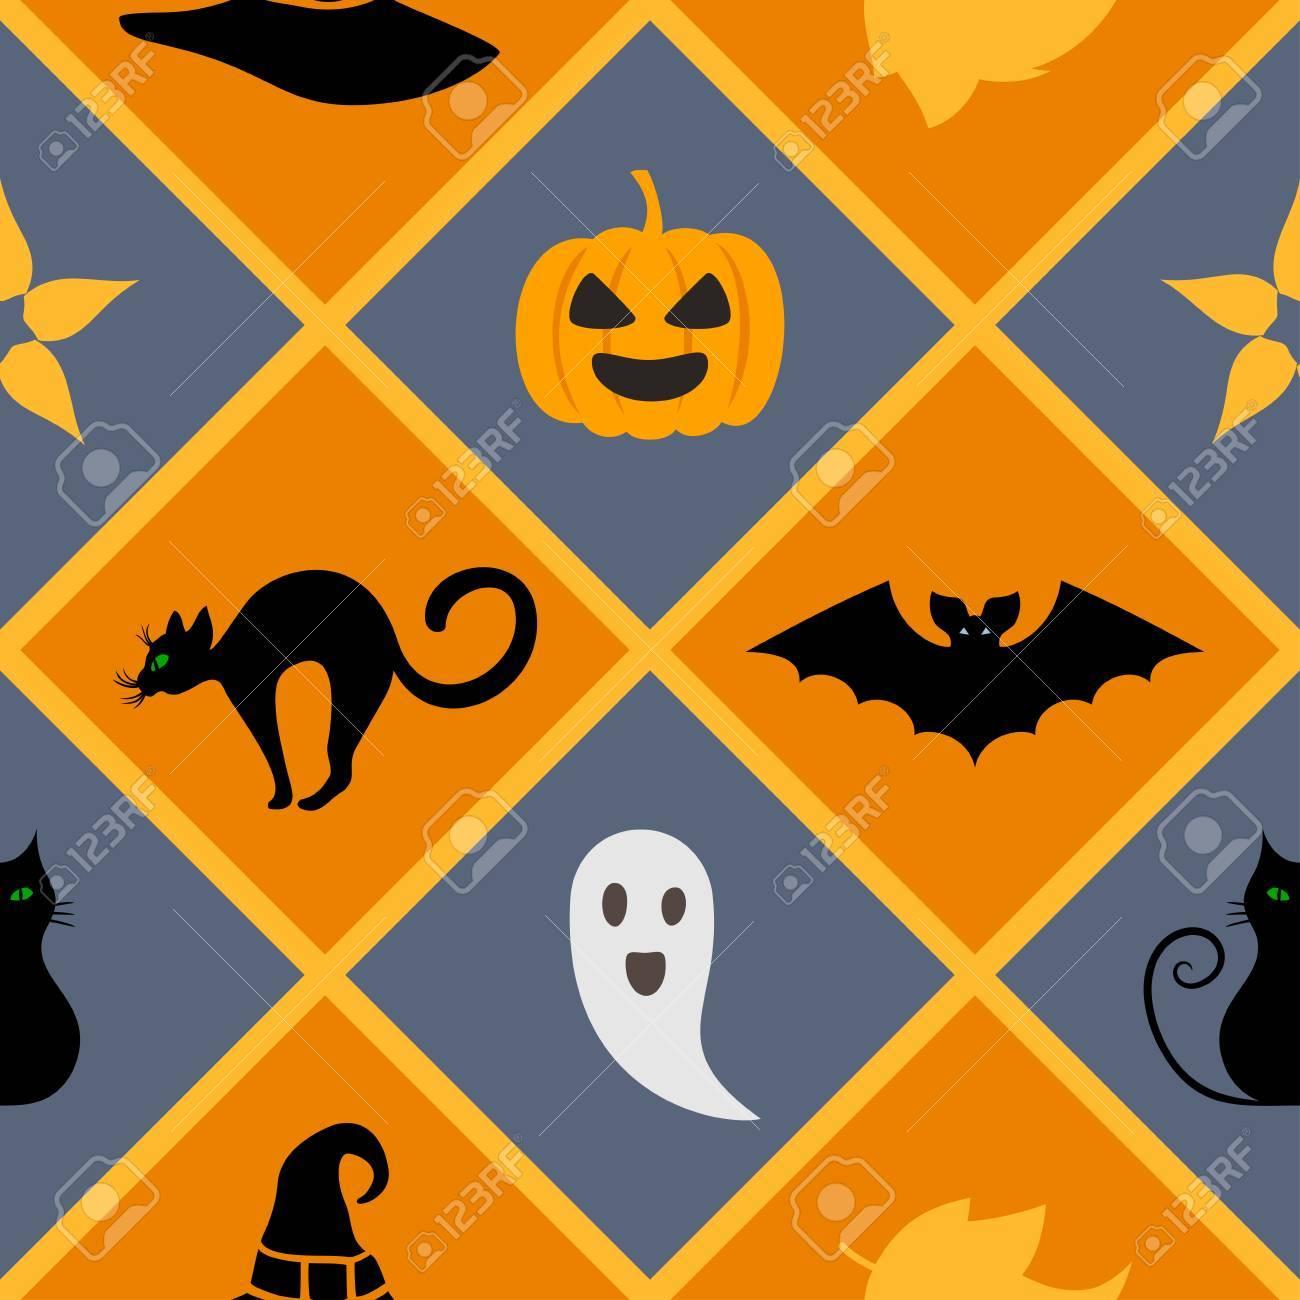 Seamless Geometric Pattern With Halloween Symbols Cat Hat Bat Ghost Leaves